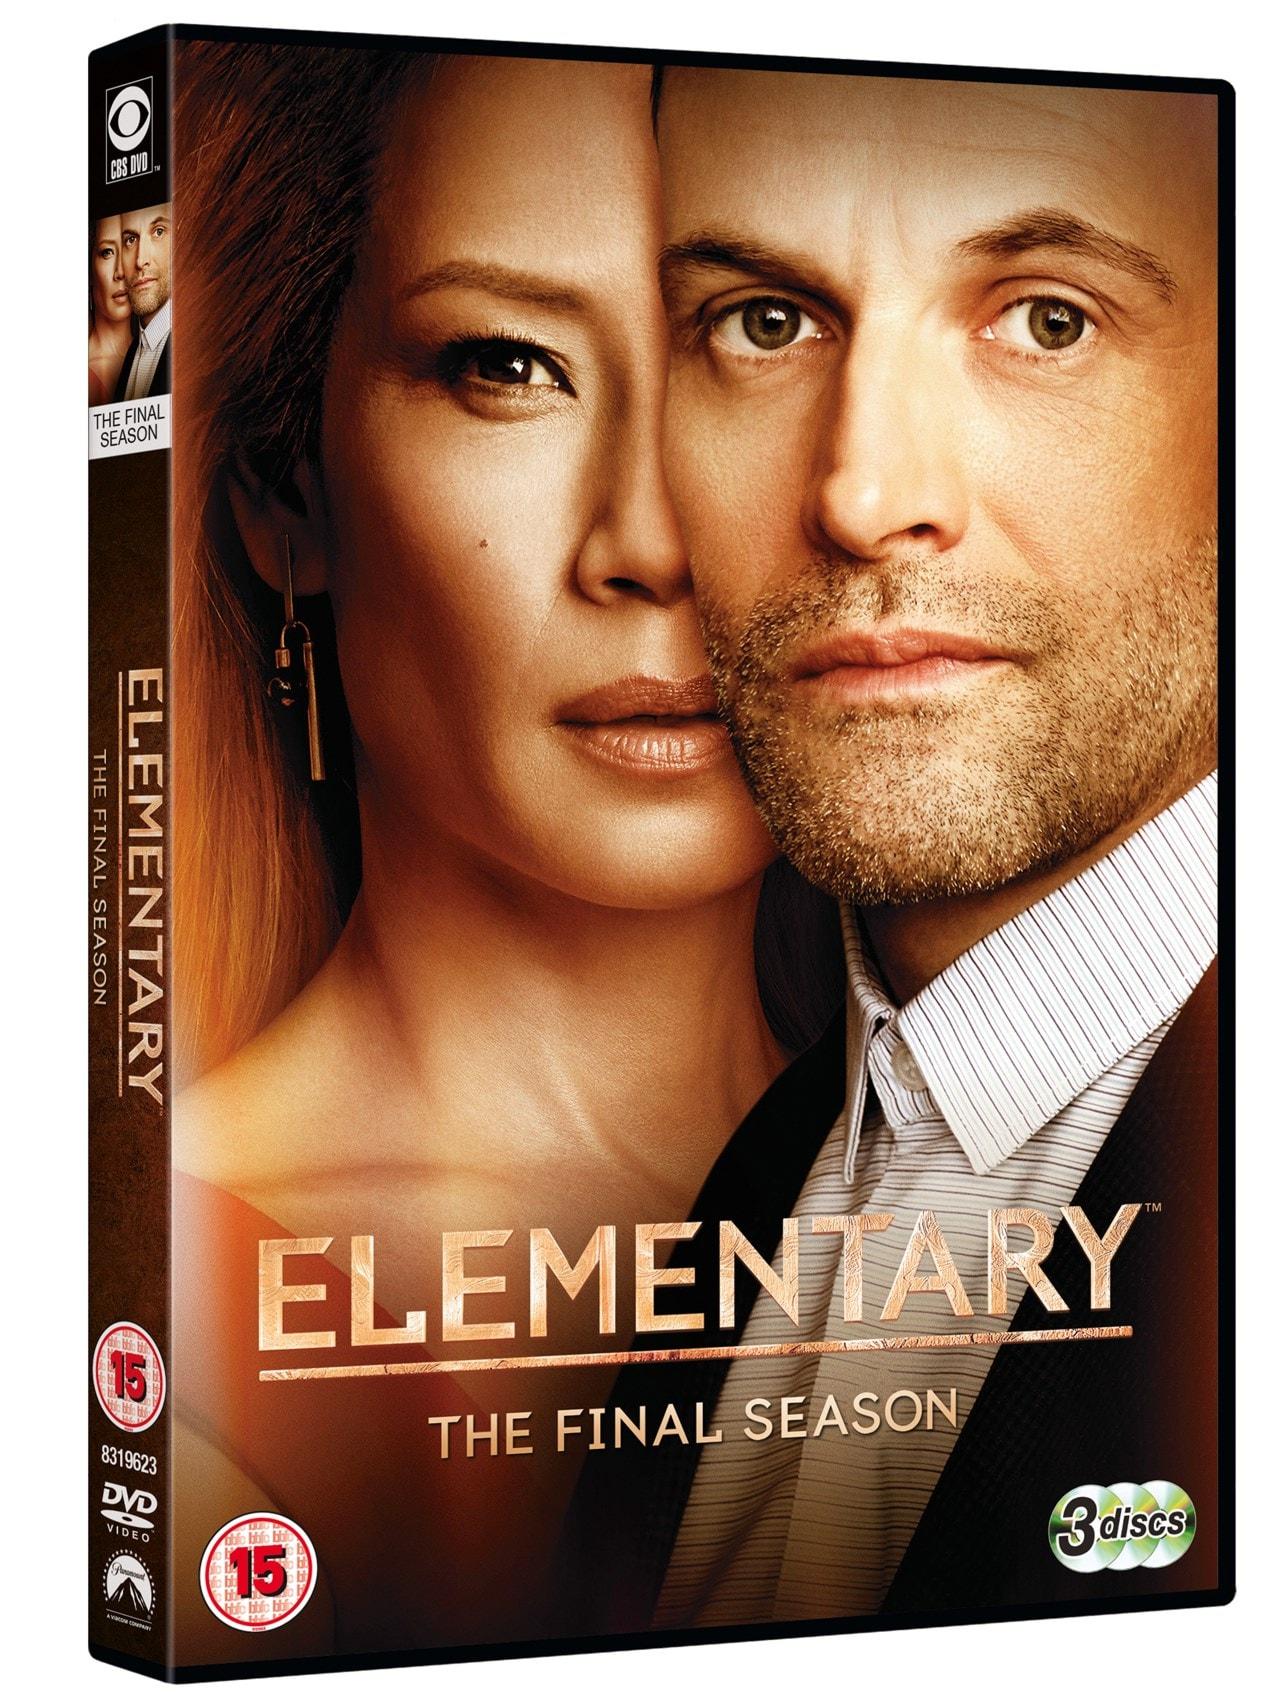 Elementary: The Final Season - 2